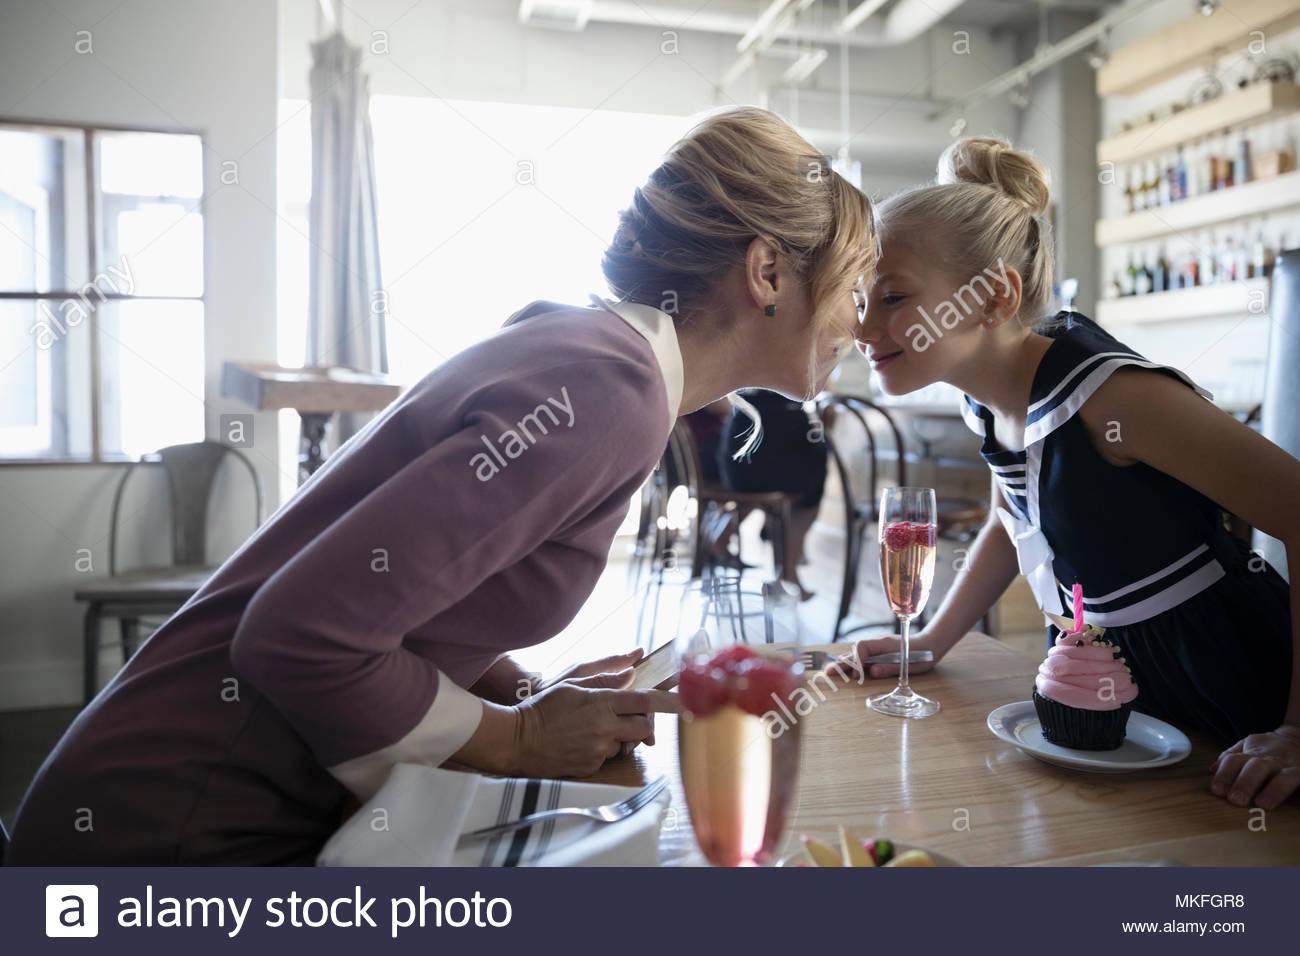 Tendre mère et fille se frottant le nez, celebrating birthday in cafe Photo Stock